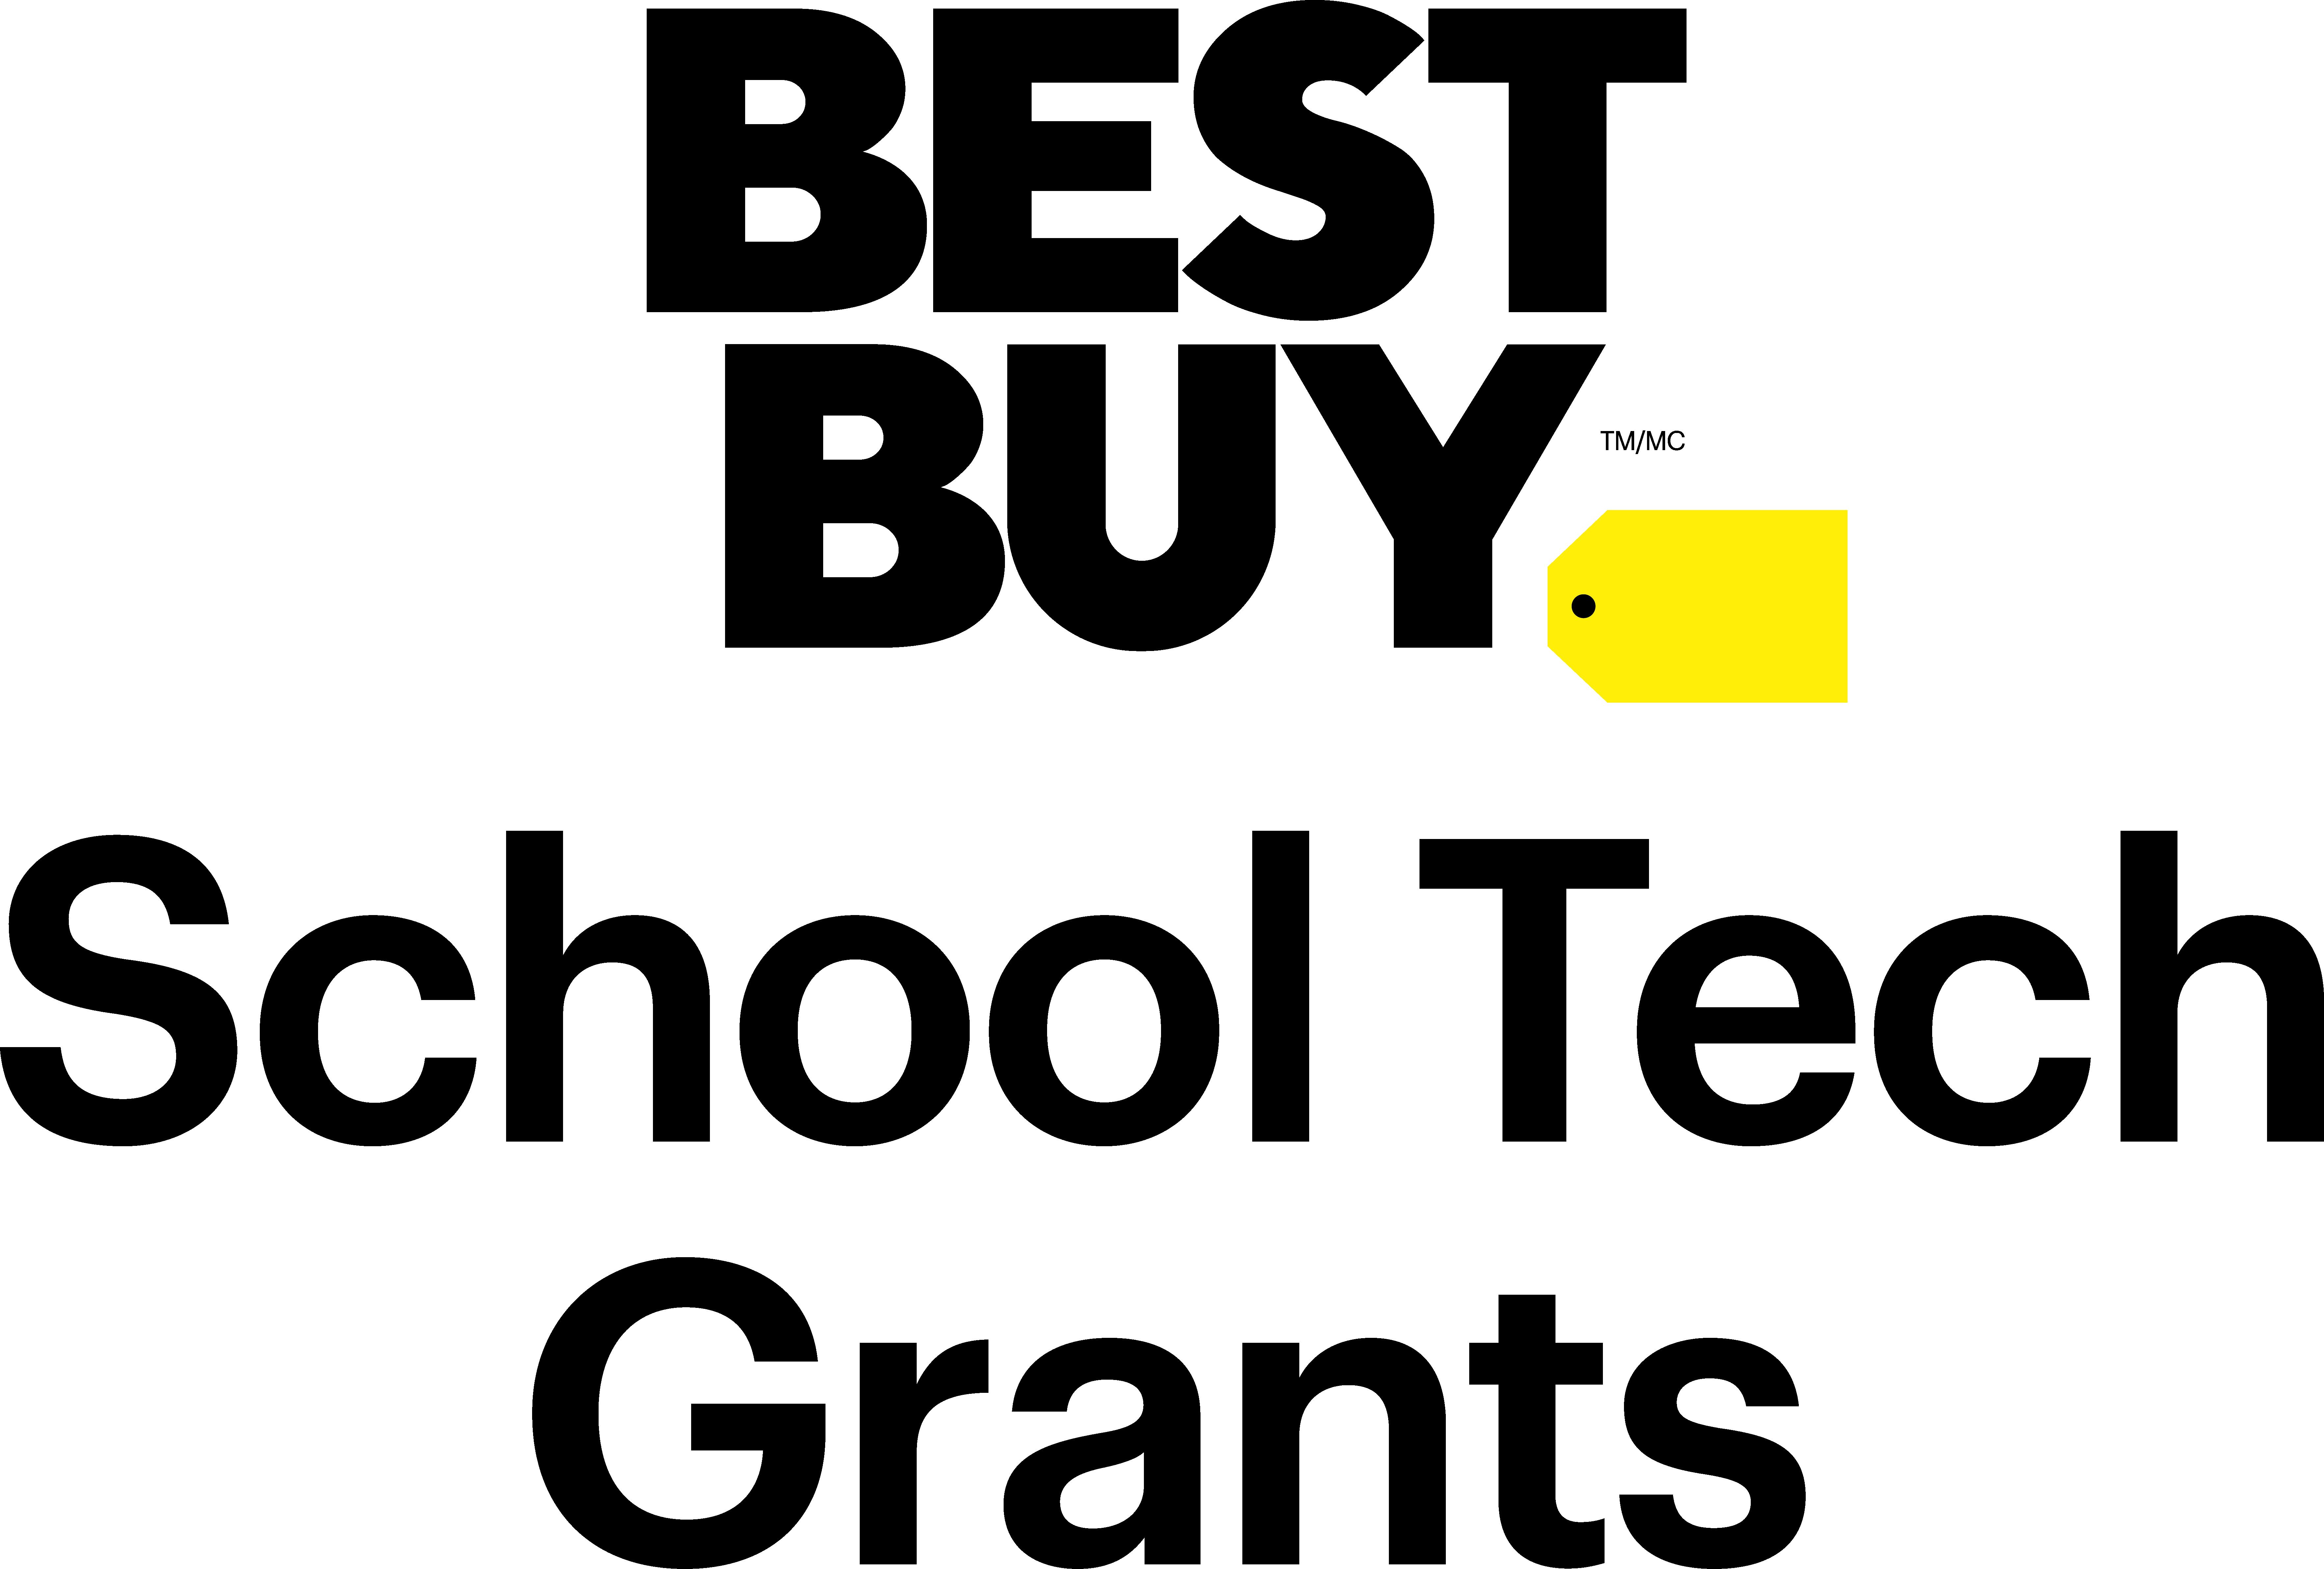 Best Buy School Tech Grants